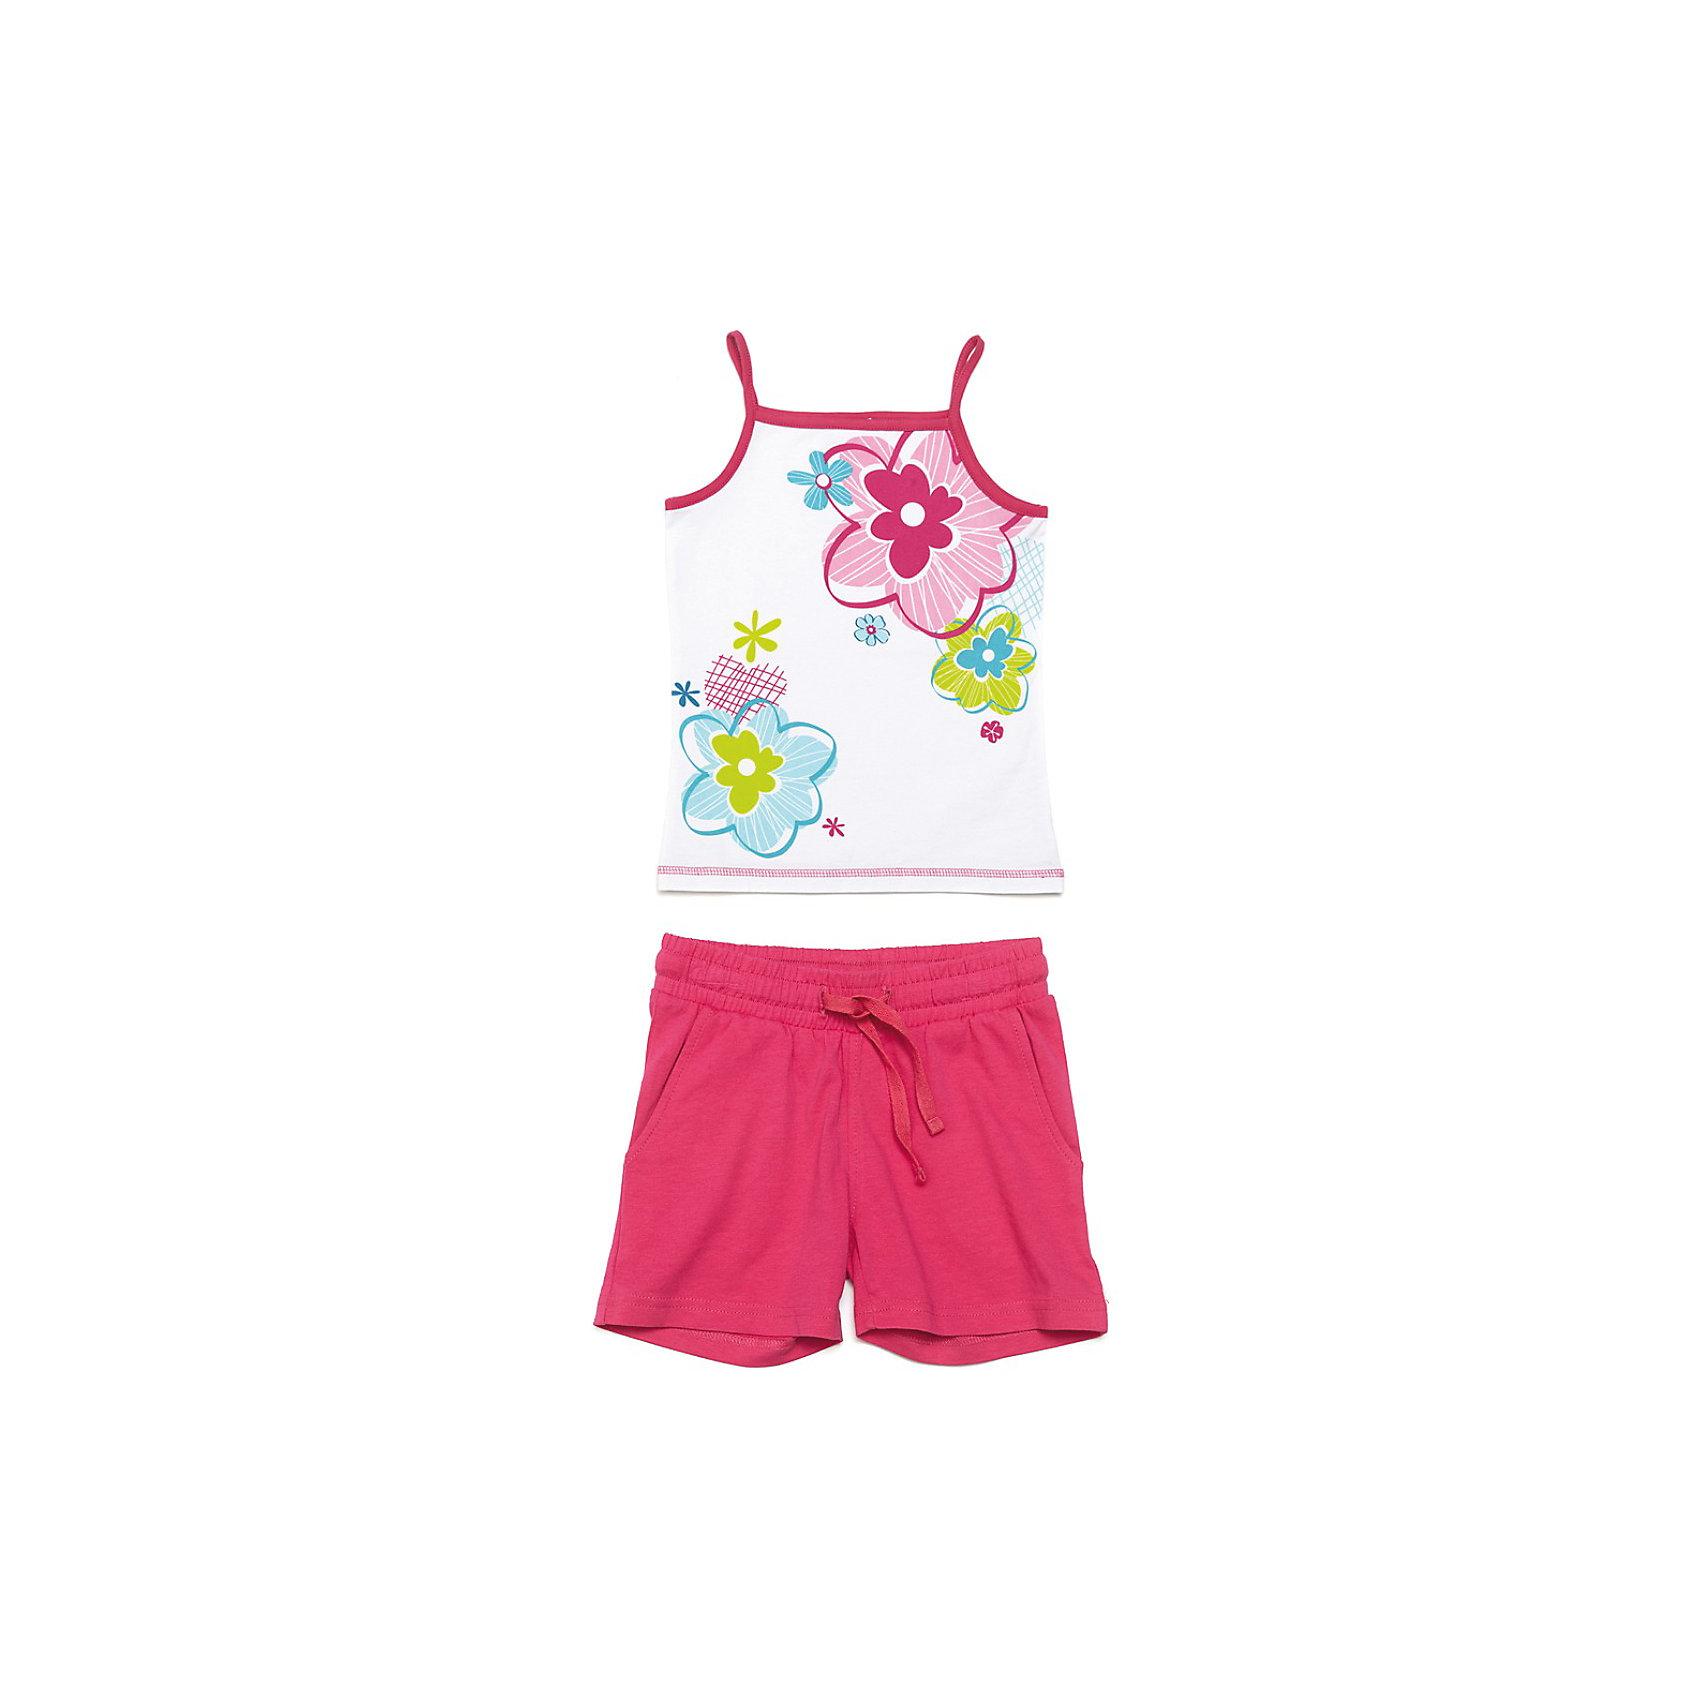 PlayToday Комплект: майка и шорты для девочки PlayToday комплект топ майка и шорты relax mode комплект топ майка и шорты